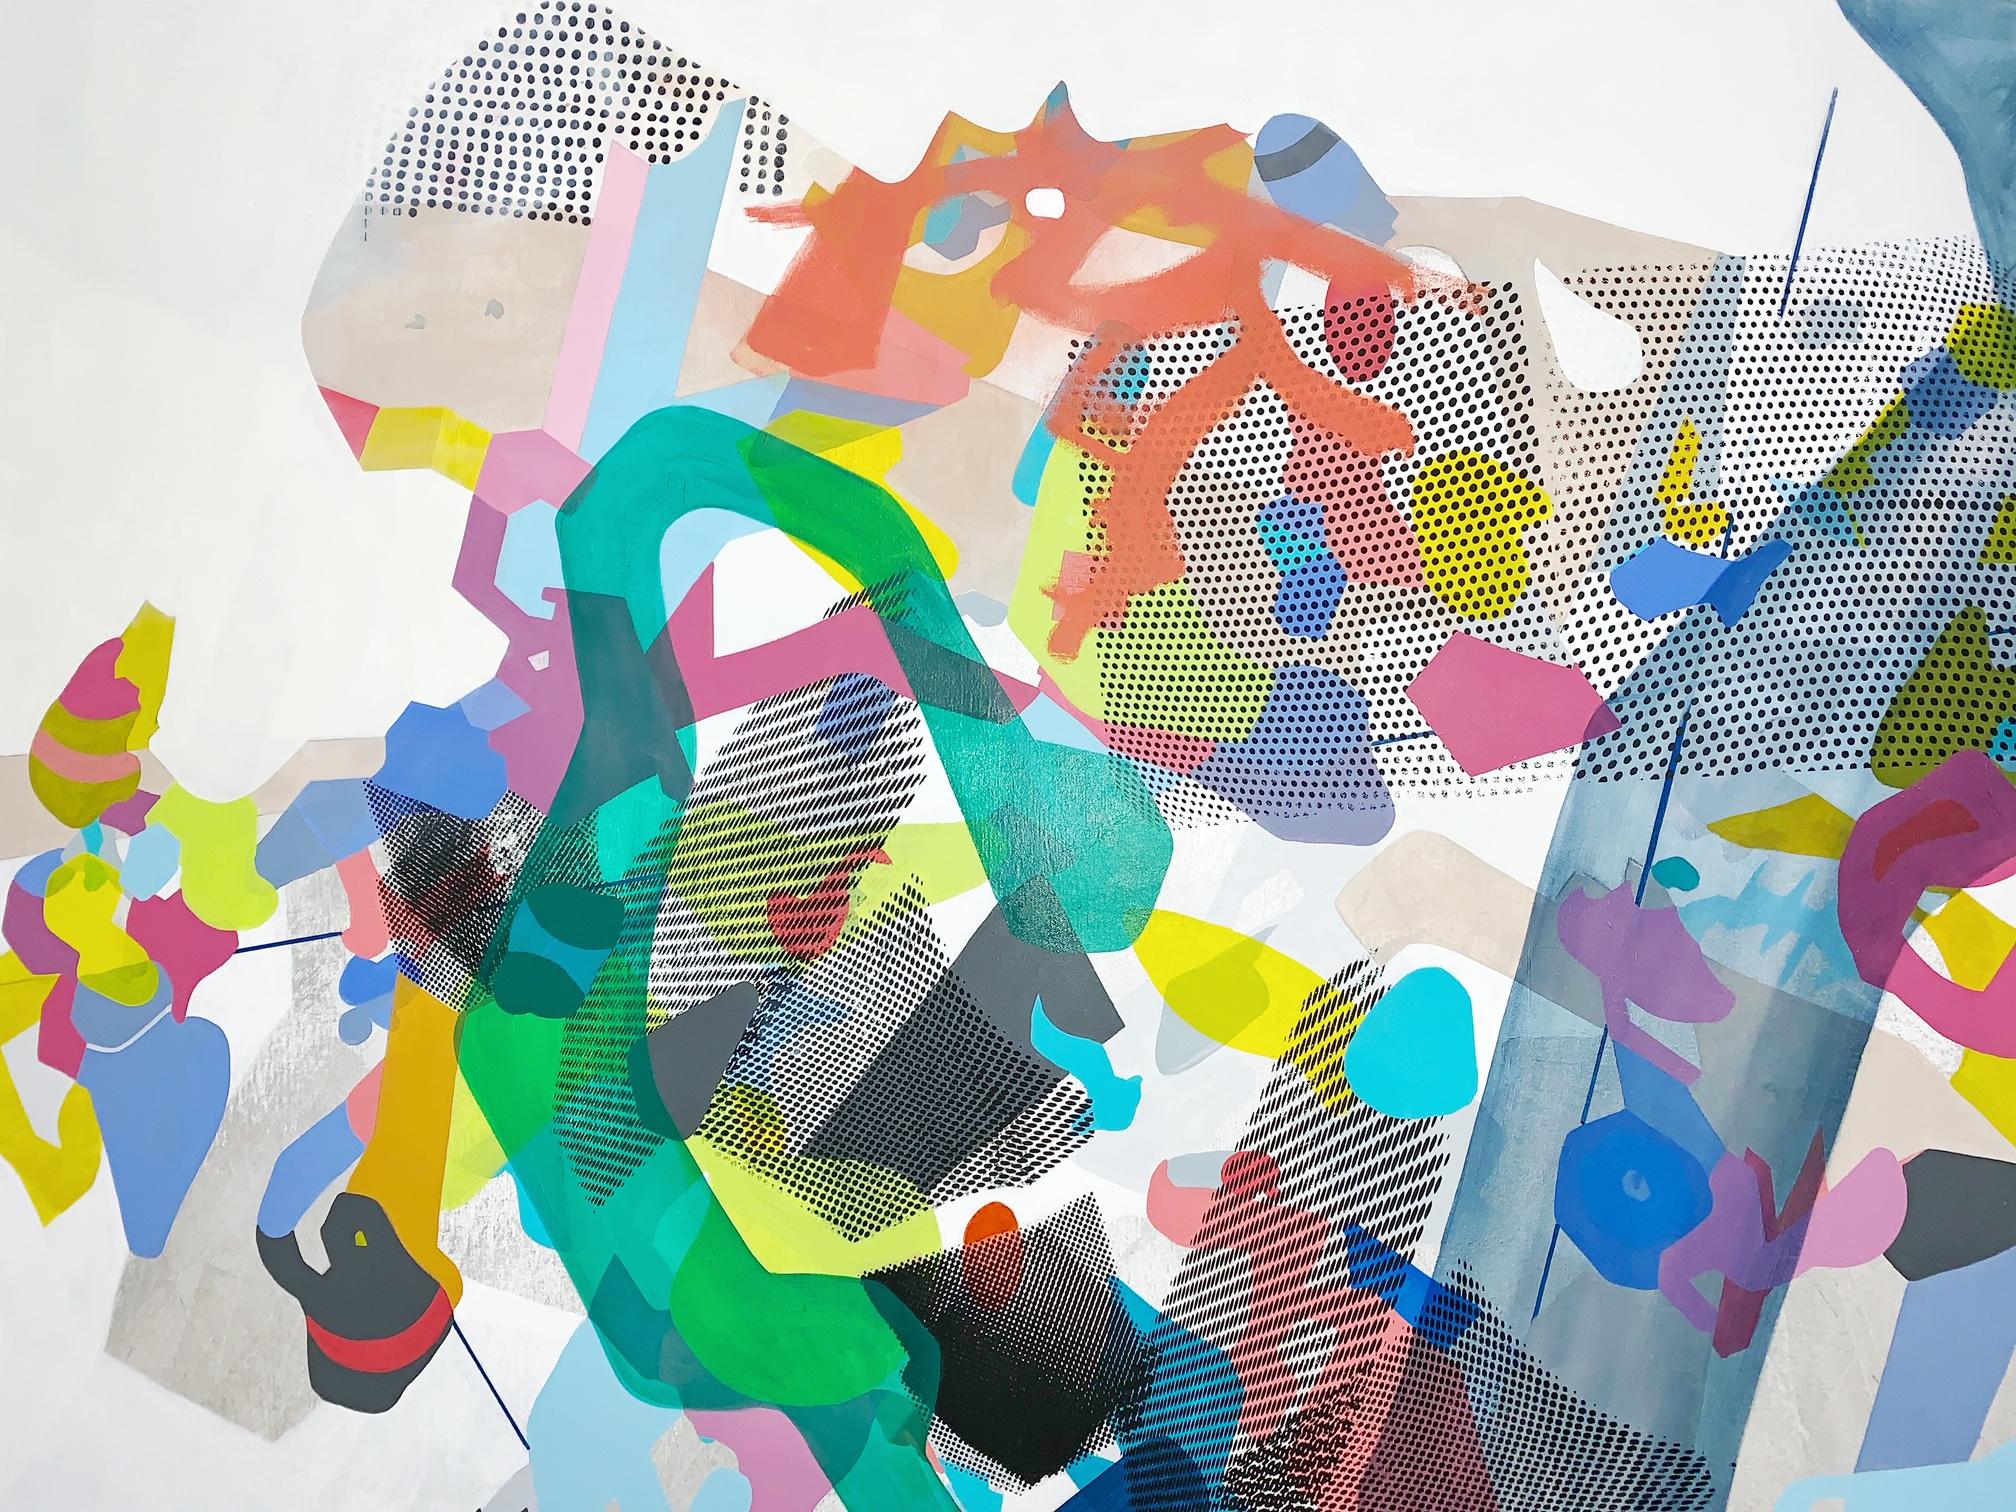 THE ART OF JOE CAMOOSA  on exhibit through September 20  see more